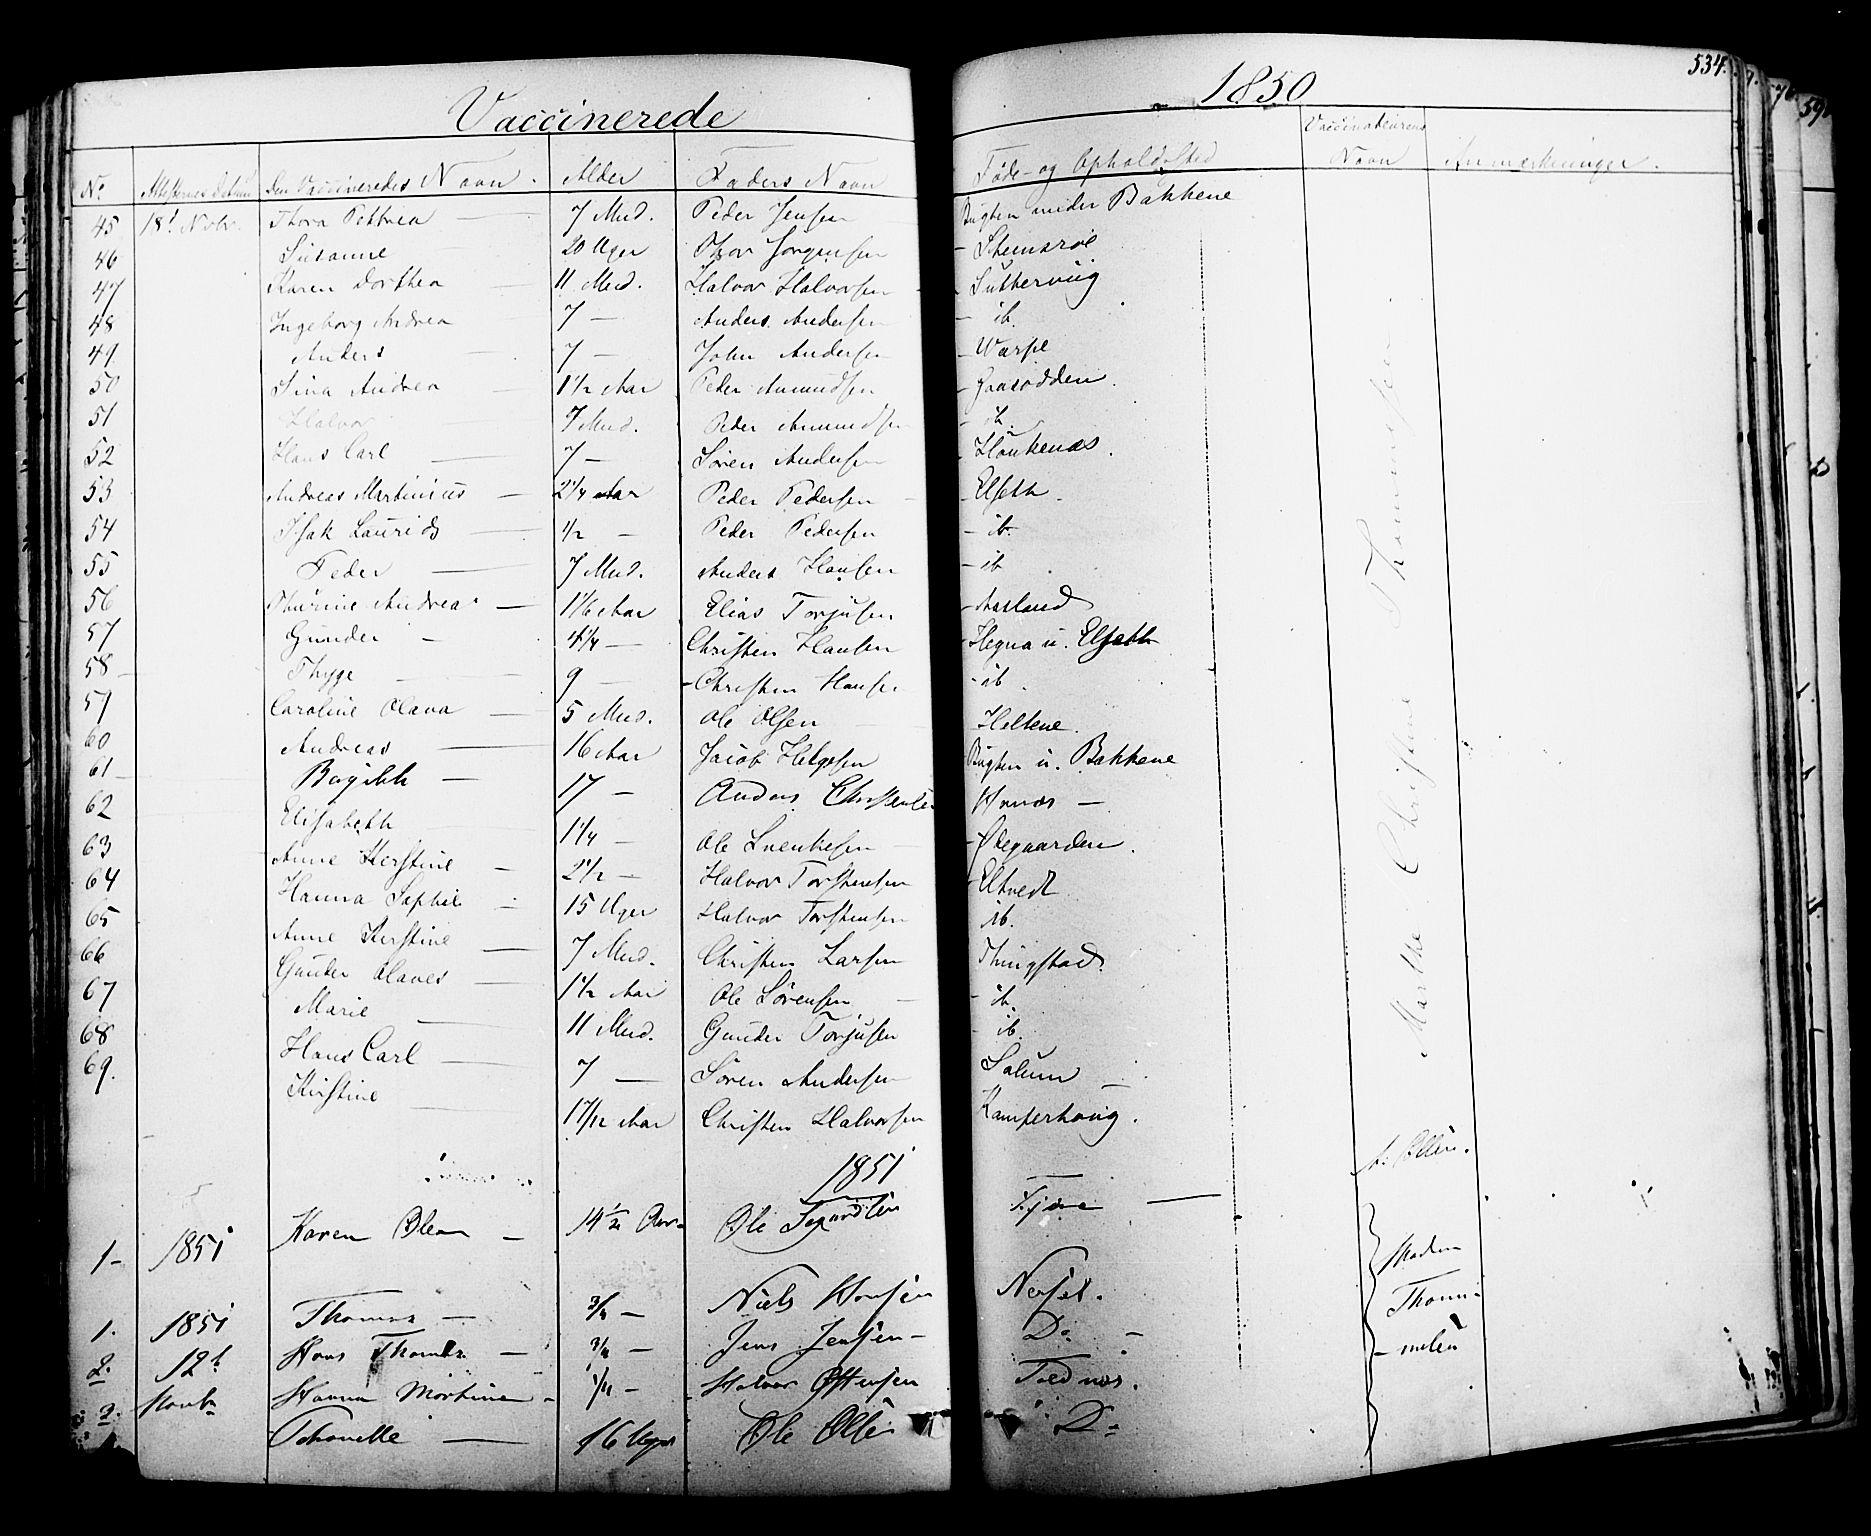 SAKO, Solum kirkebøker, F/Fa/L0006: Ministerialbok nr. I 6, 1844-1855, s. 534